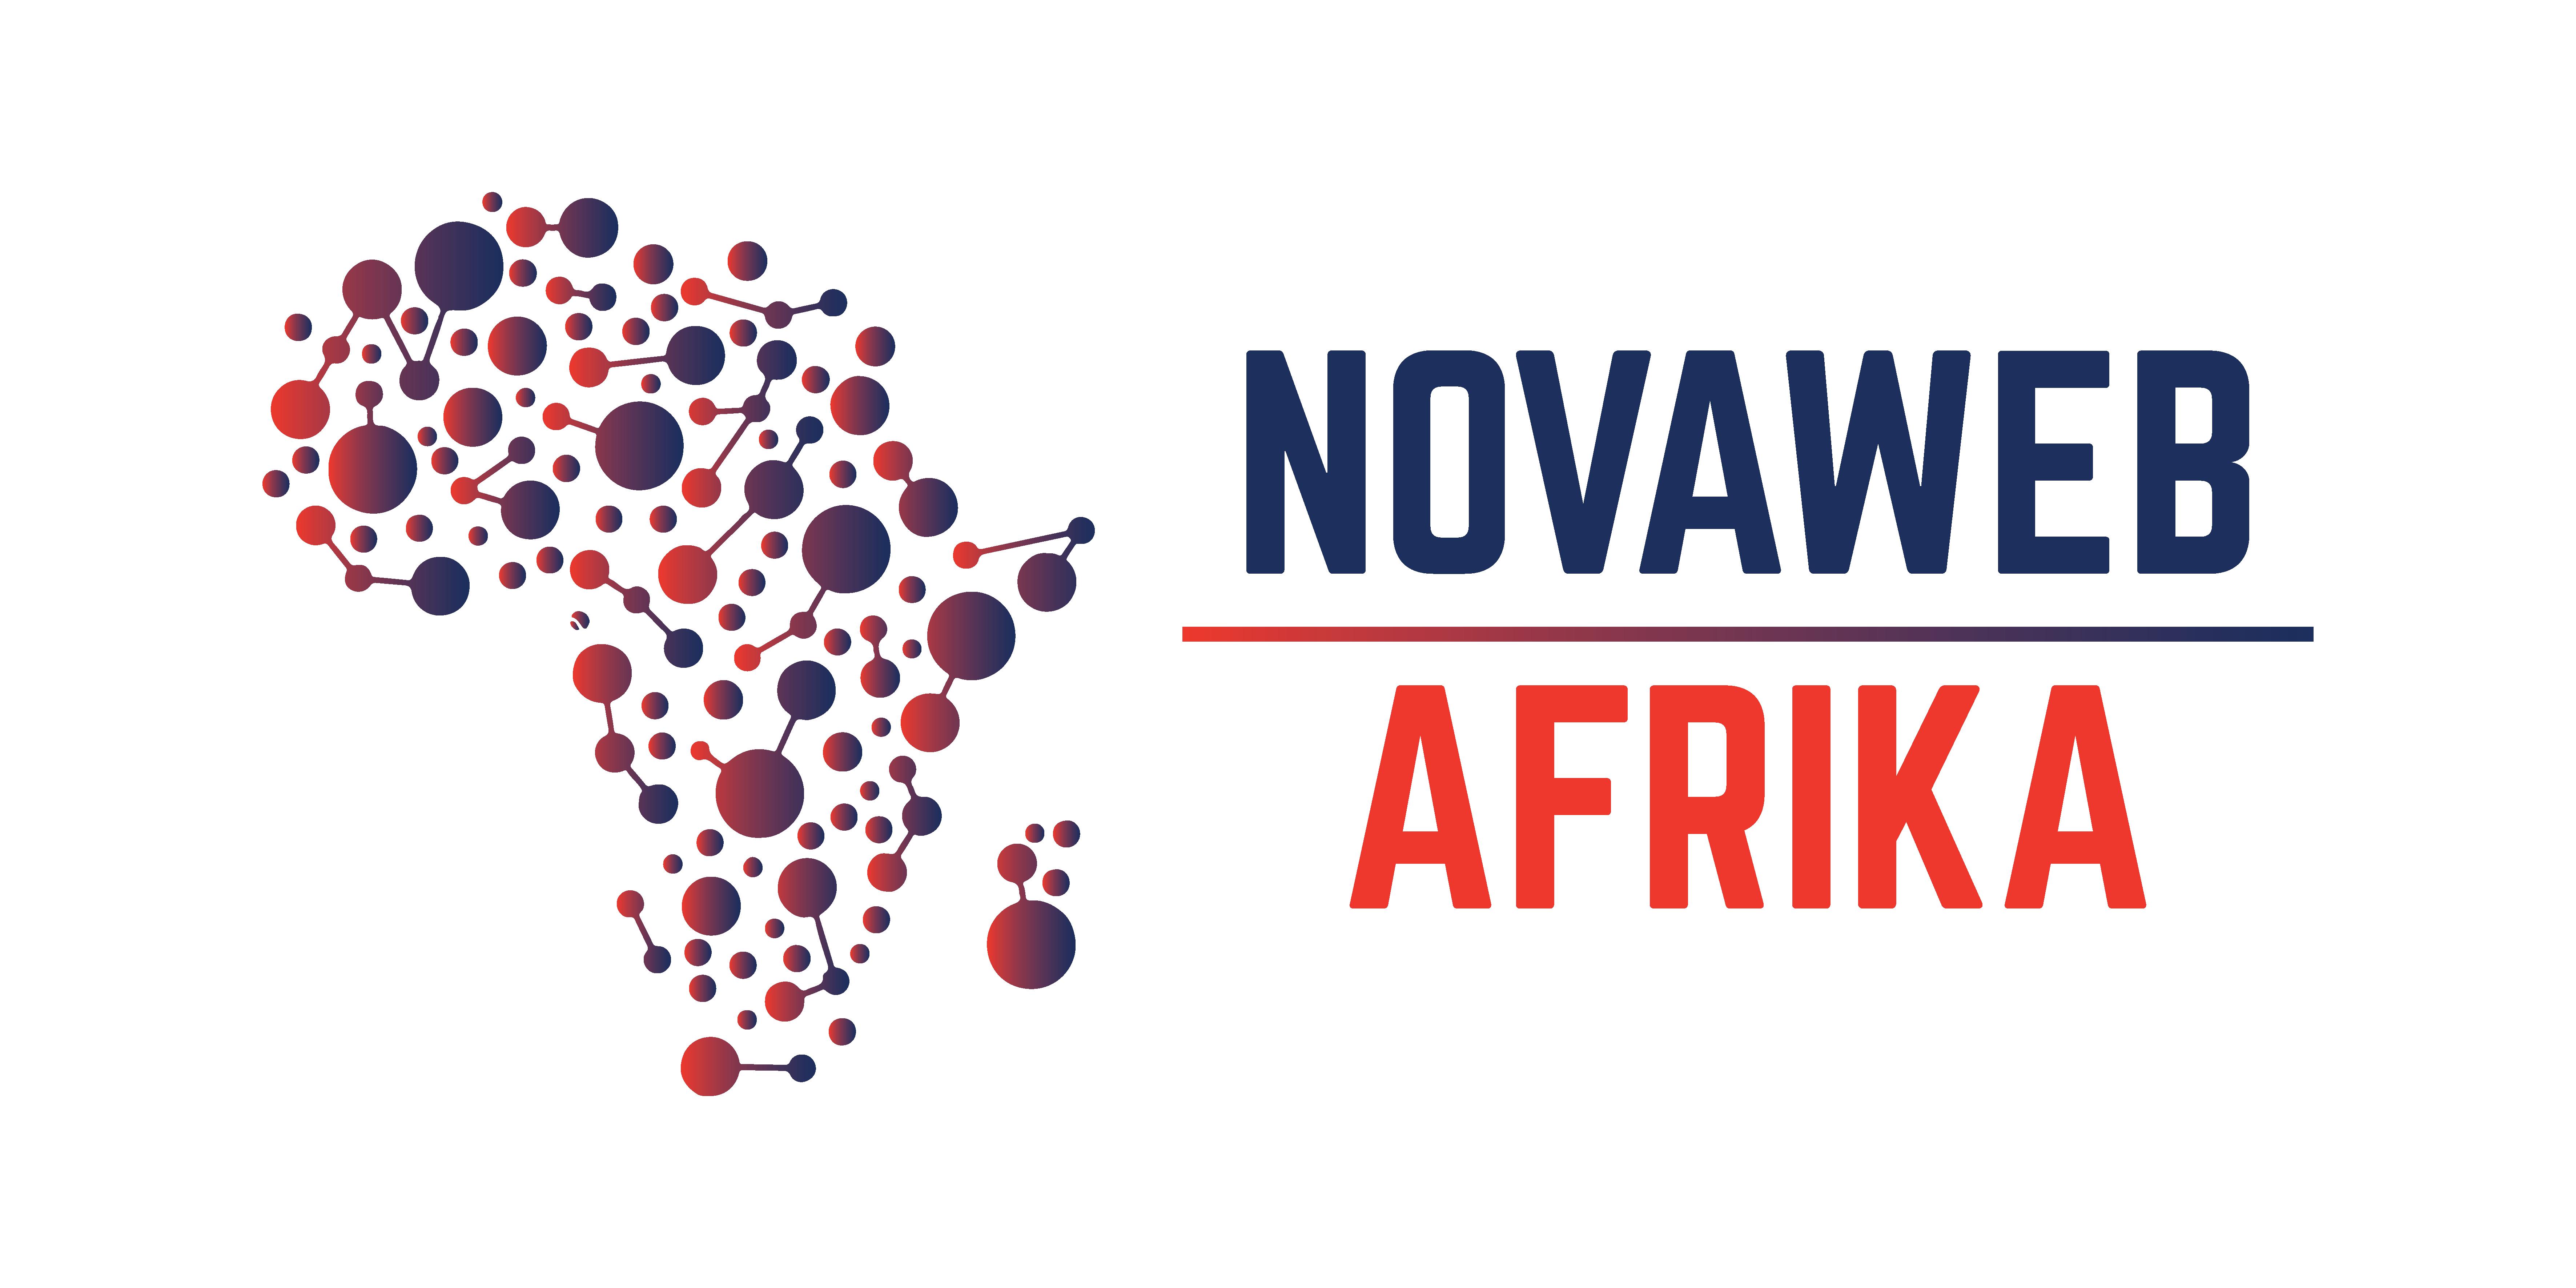 Novaweb Afrika